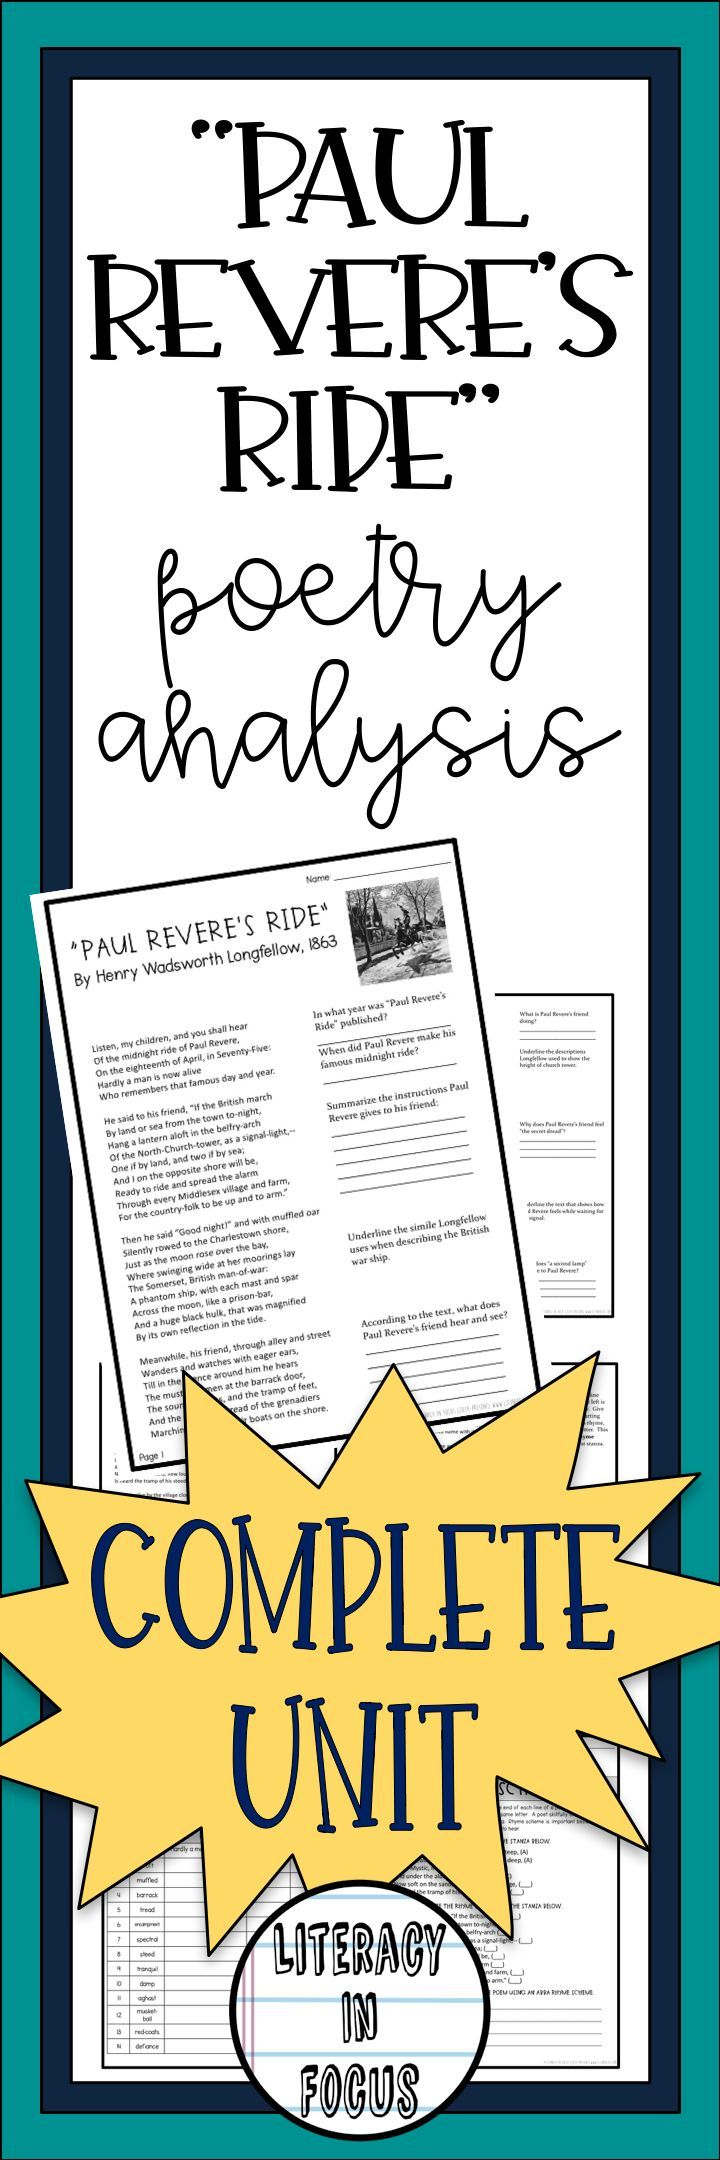 Paul Revere S Ride Poetry Activity Longfellow Poetry Analysis Paul Revere Language Arts Lesson Plans